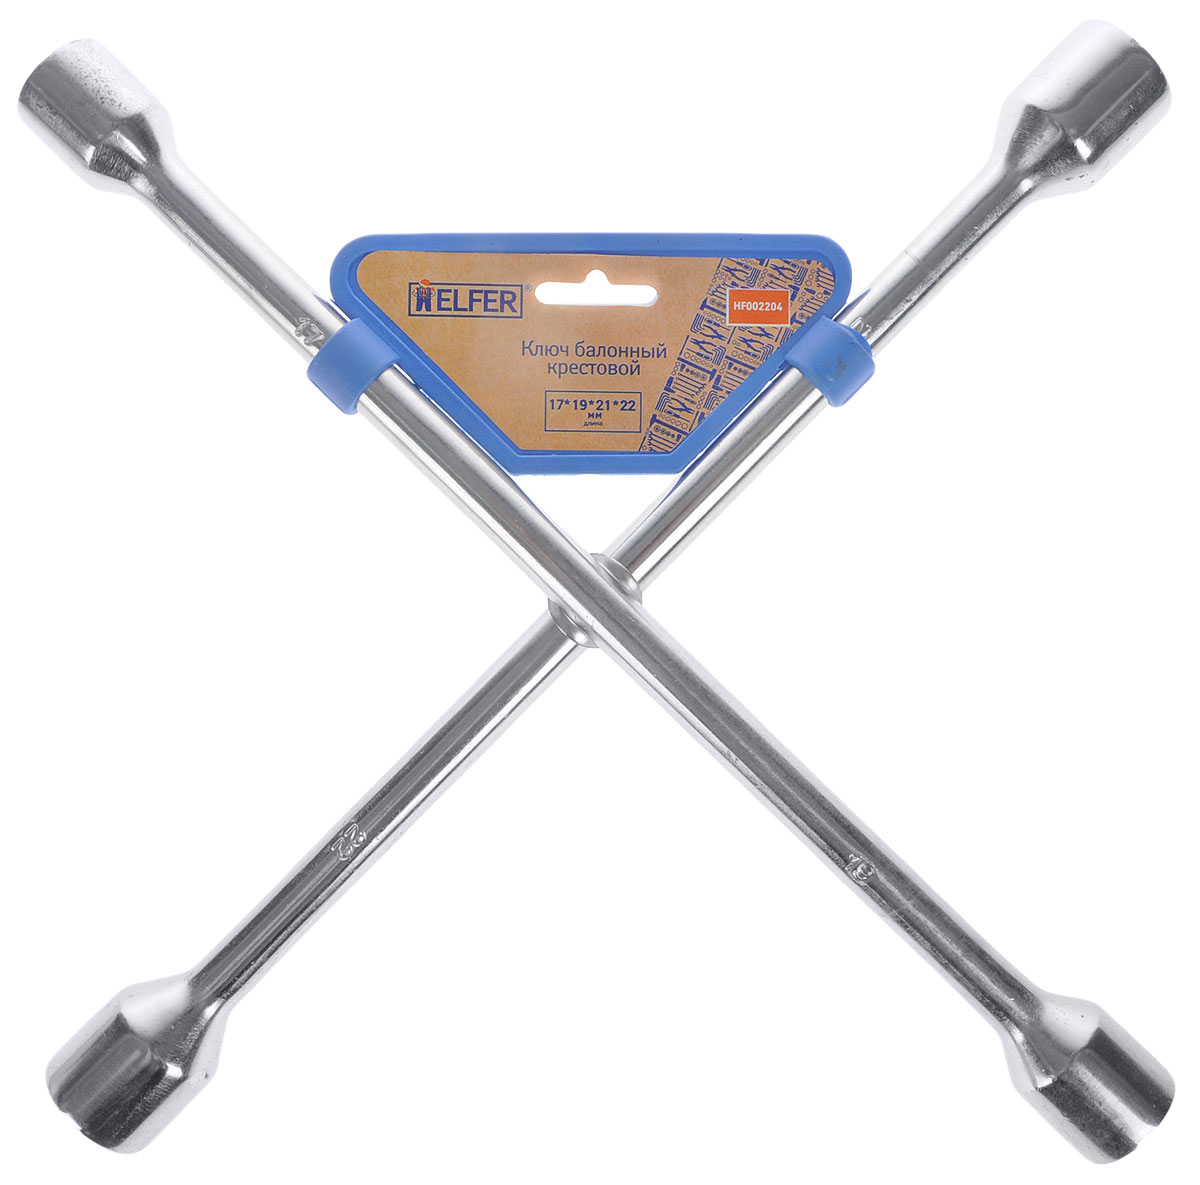 Ключ баллонный крестовой Helfer, 17мм, 19 мм, 21 мм, 22 мм ключ баллонный matrix двухсторонний 30x32 мм толщина 26 мм длина 350 мм 14296